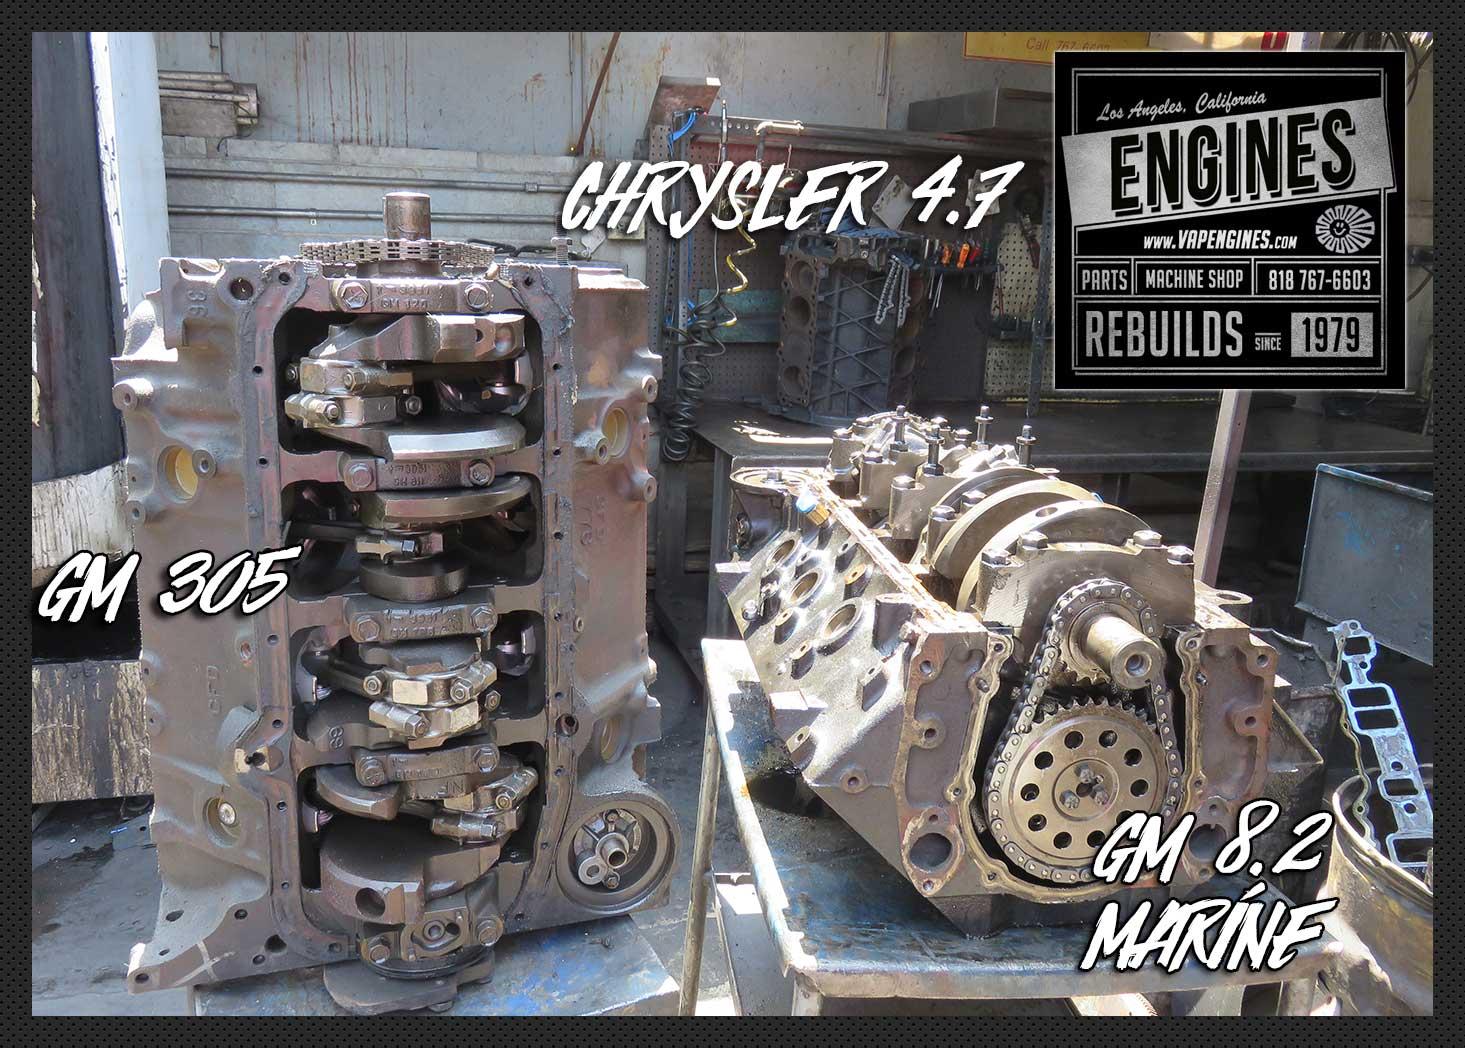 Los Angeles Engine Builder Machine Shop Los Angeles